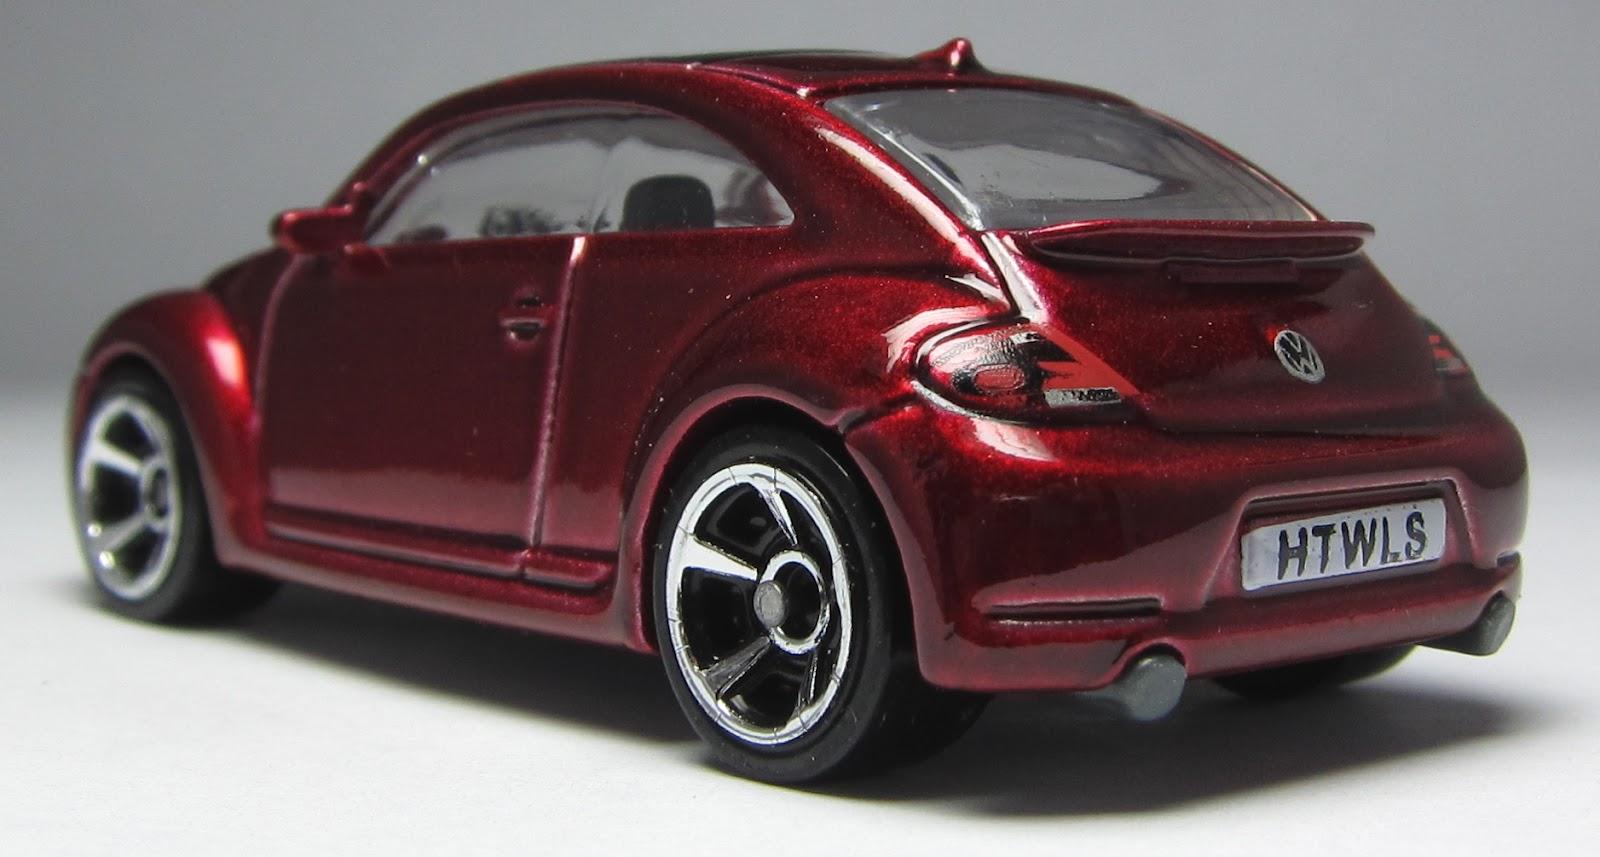 first look hot wheels 2012 volkswagen beetle the. Black Bedroom Furniture Sets. Home Design Ideas